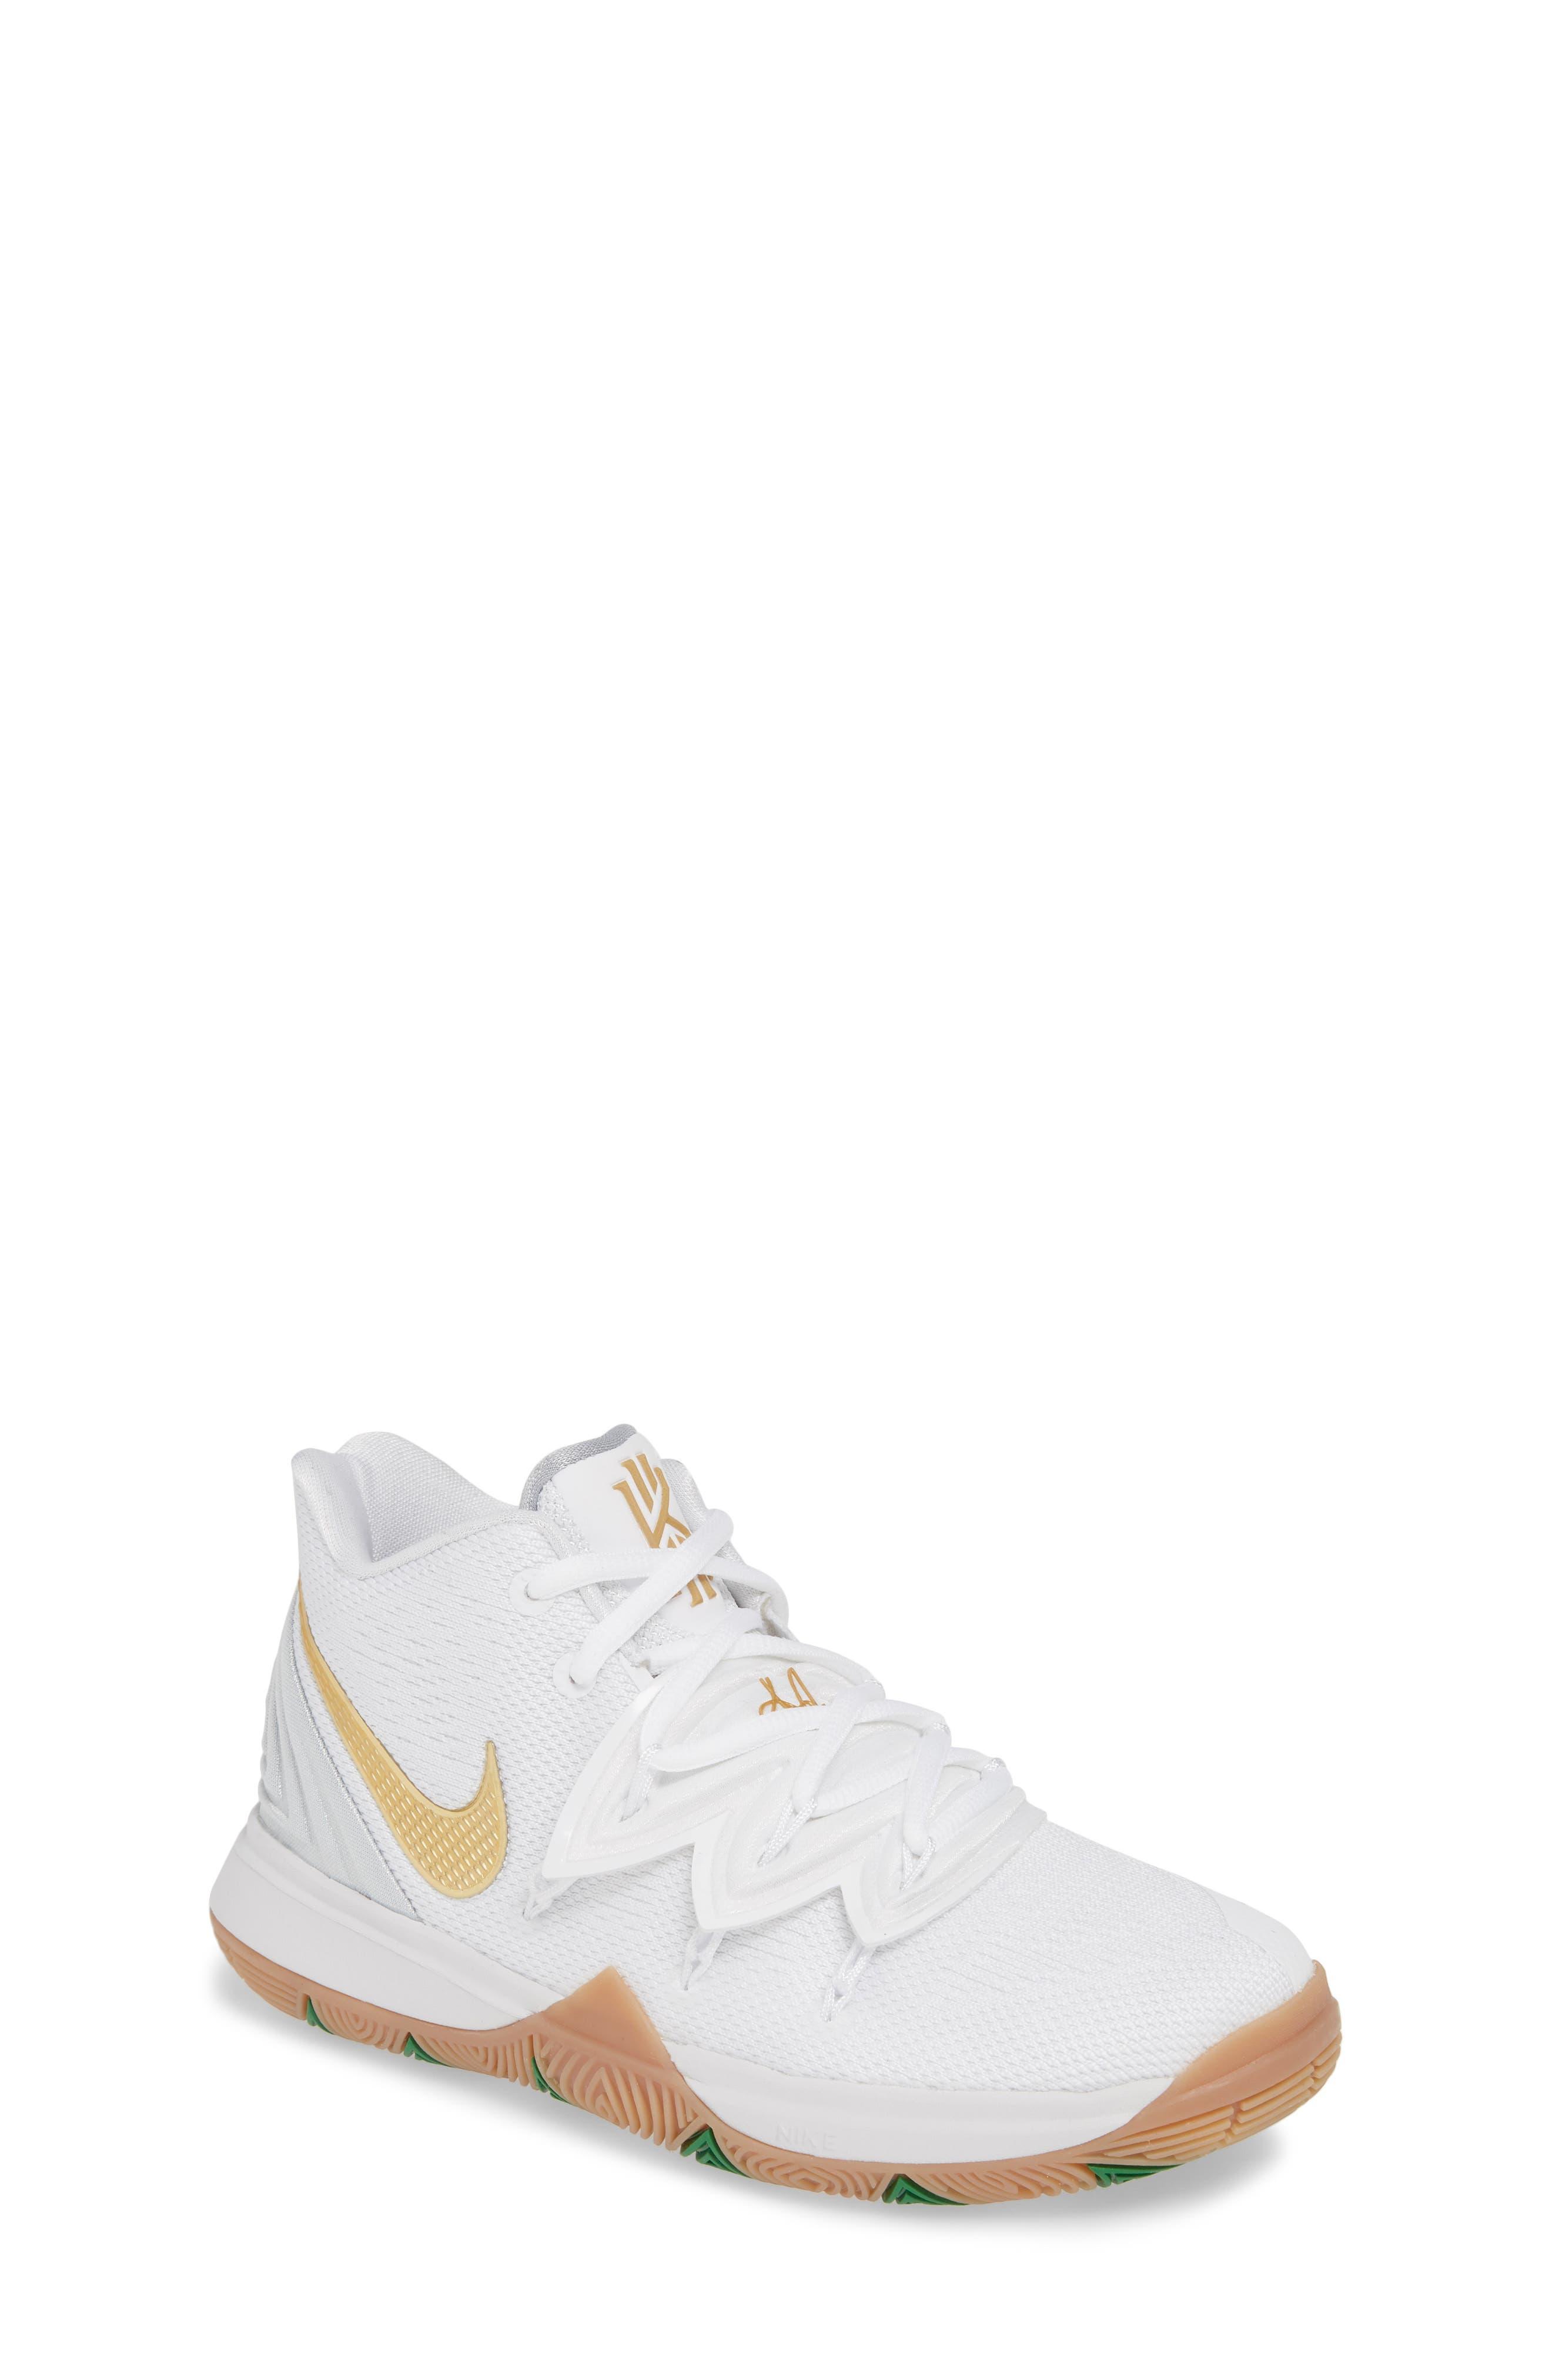 NIKE Kyrie 5 Basketball Shoe, Main, color, WHITE/ METALLIC GOLD-PLATINUM